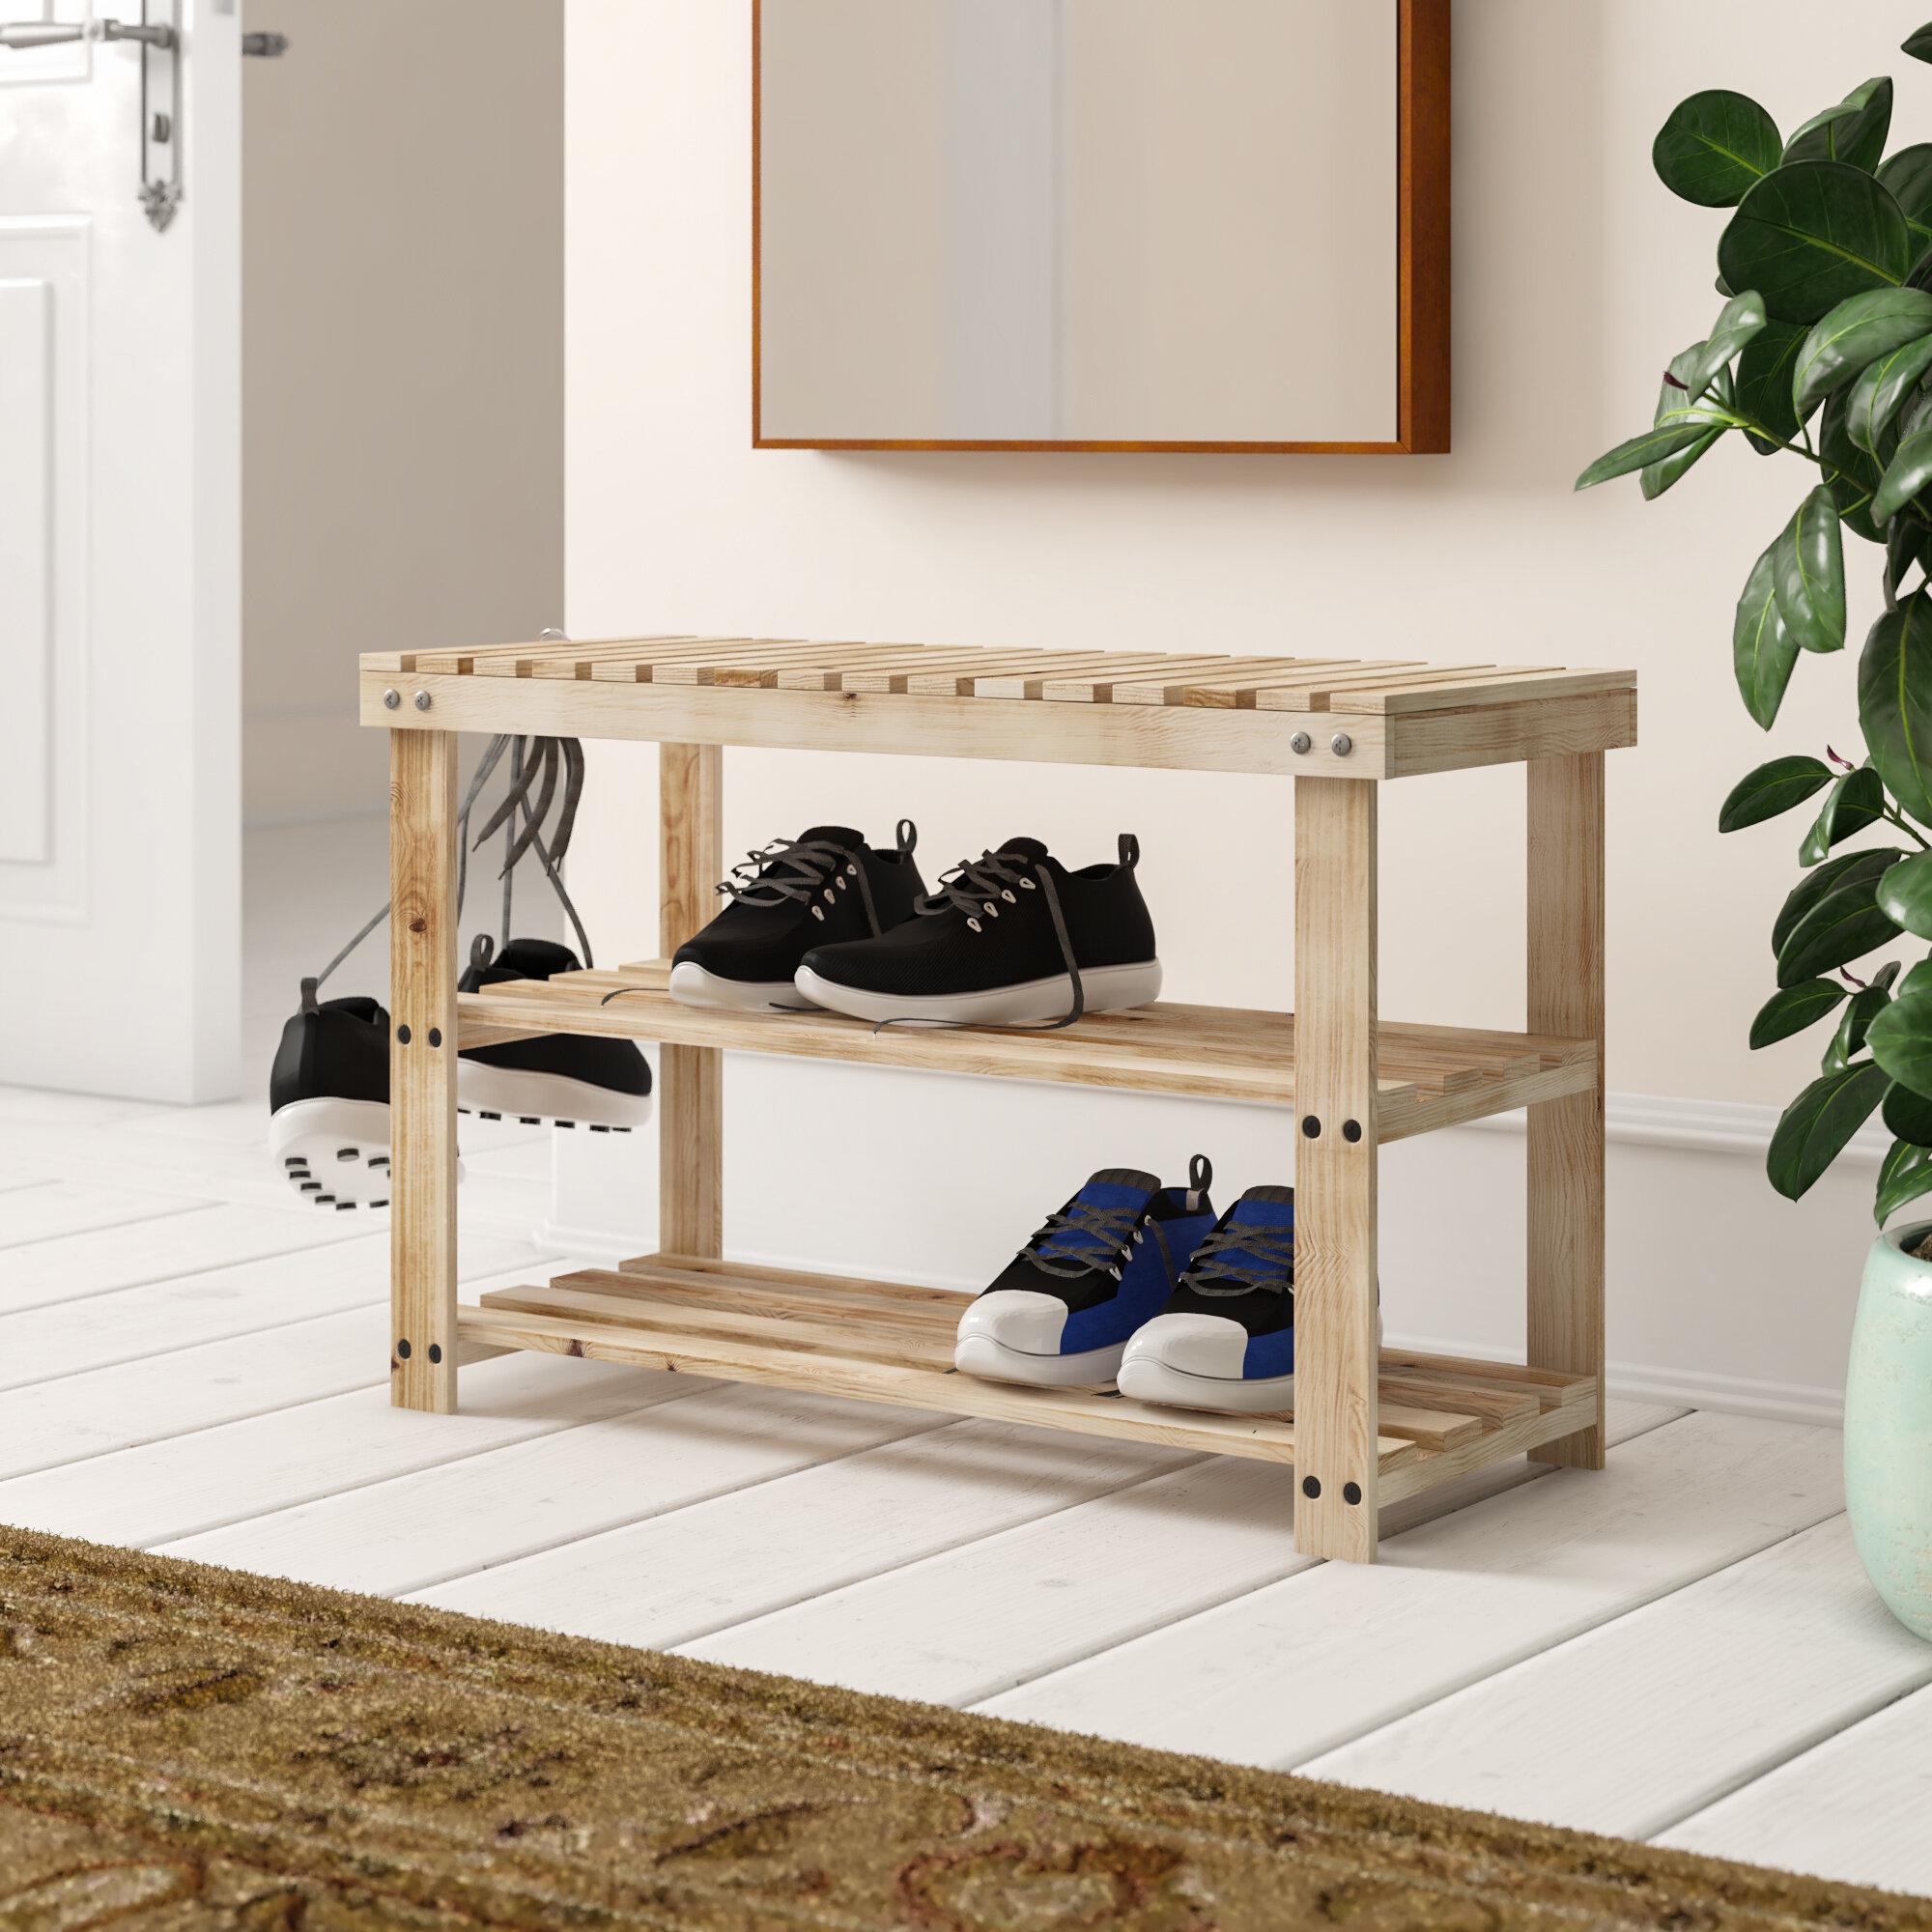 Symple Stuff 12 Pair Shoe Storage Bench Reviews Wayfair Co Uk